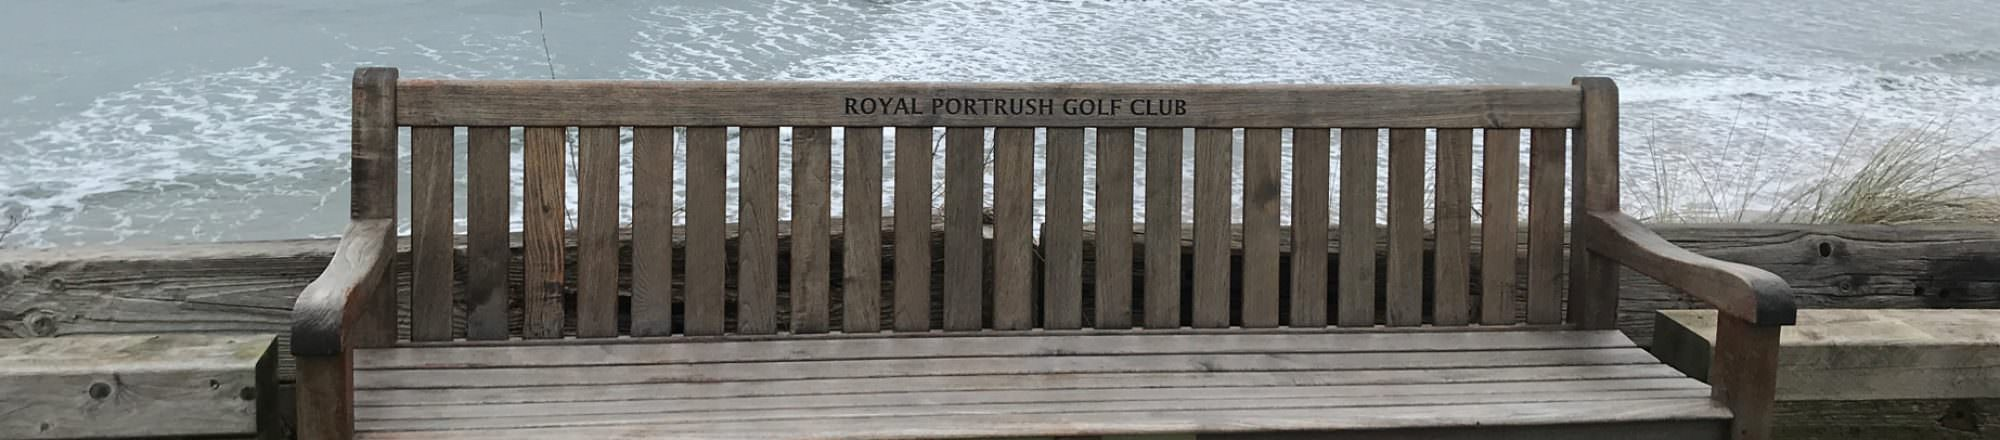 Played by NCG: Royal Portrush